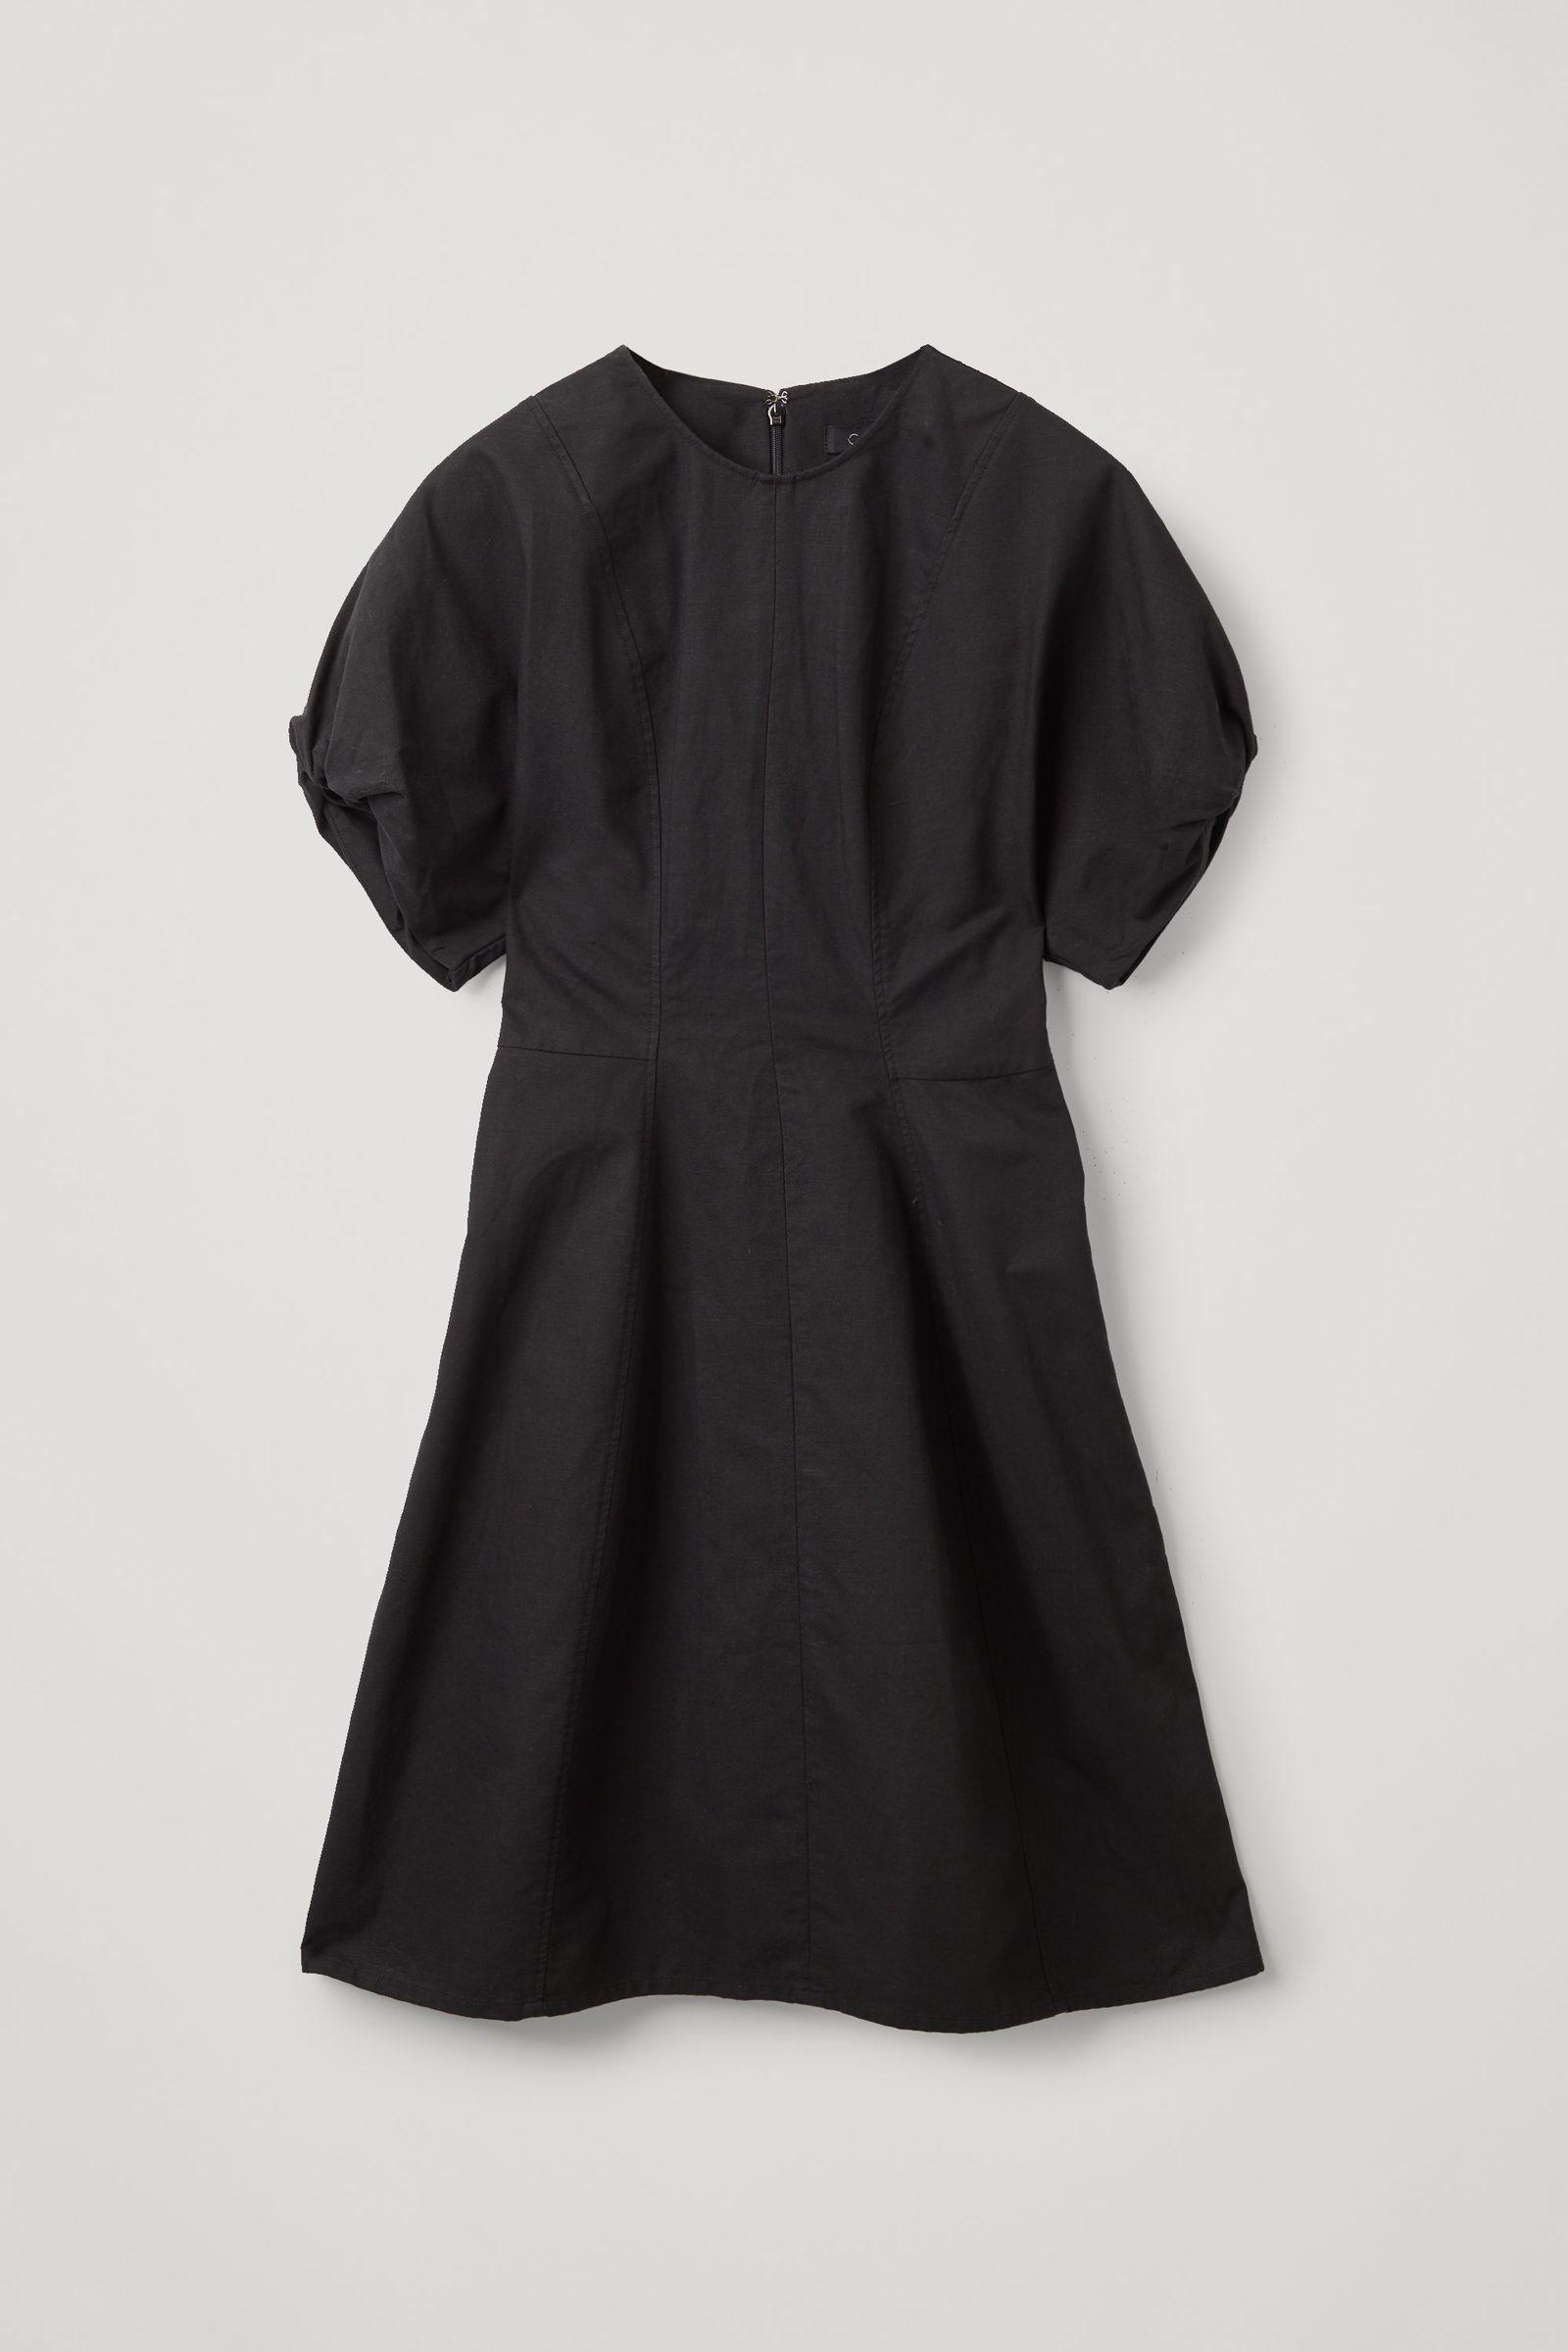 COS 스컬프티드 코튼 퍼프 슬리브 드레스의 블랙컬러 Product입니다.